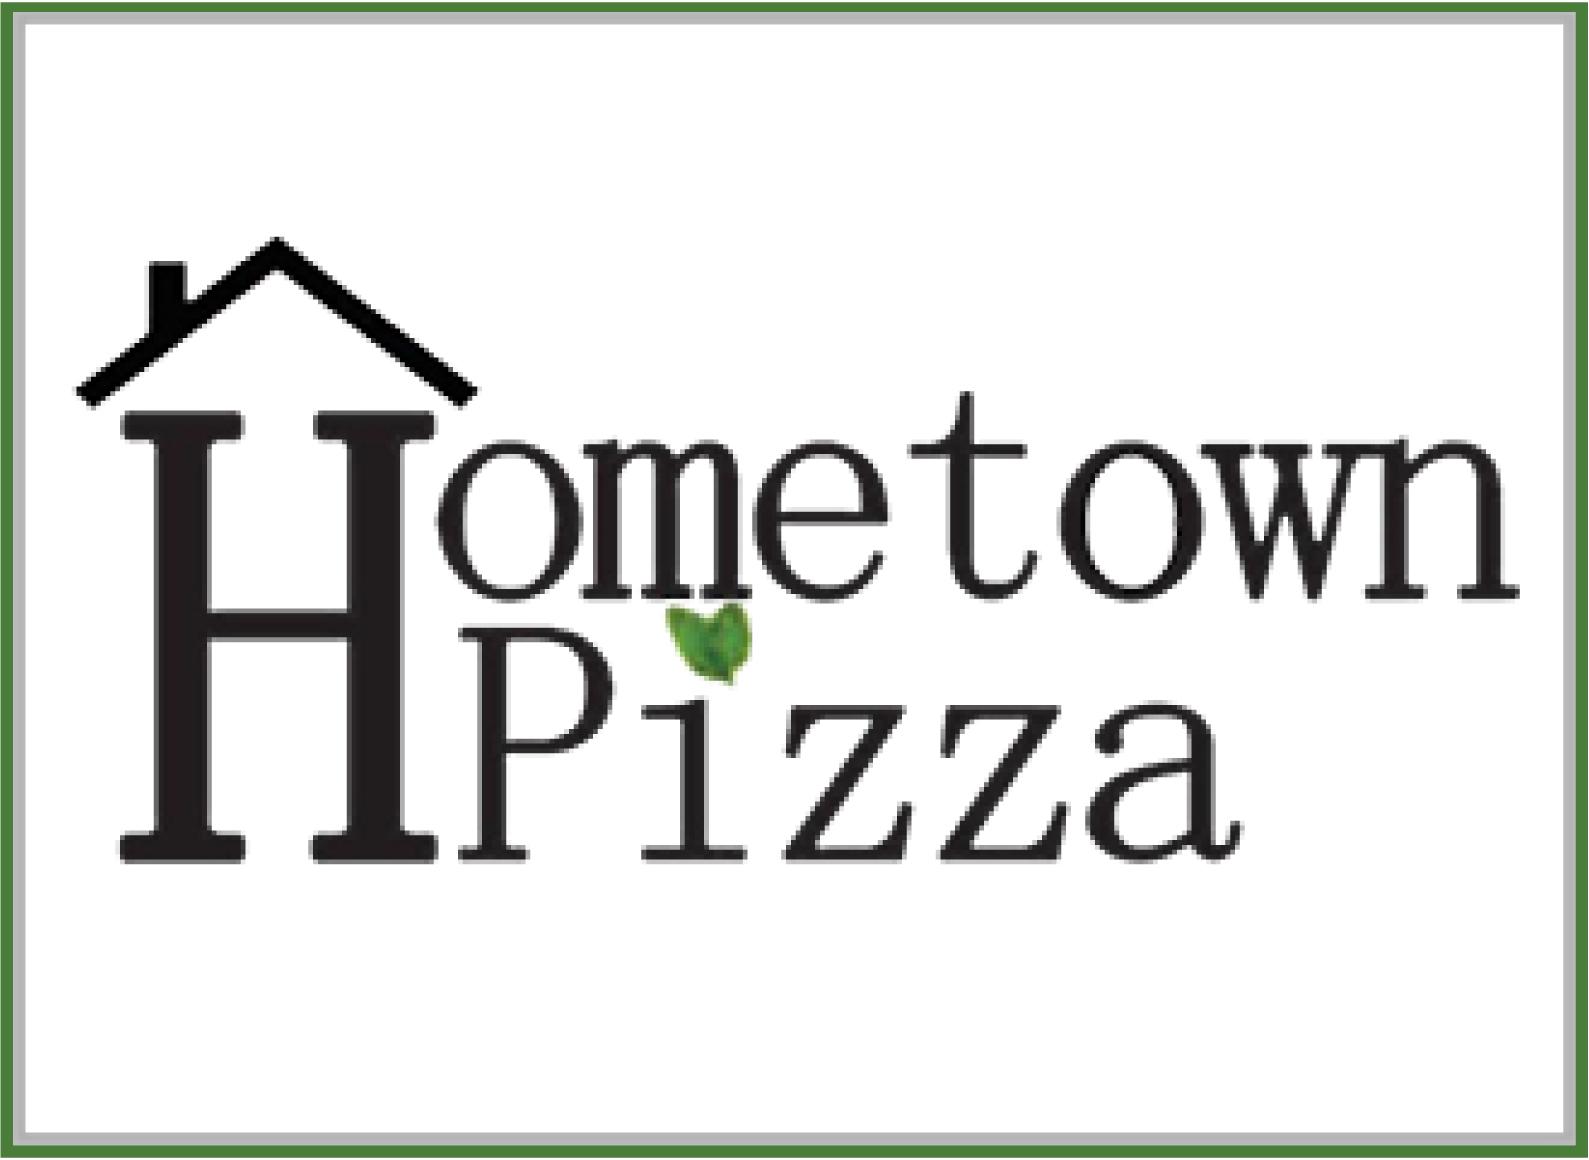 Hometown-02